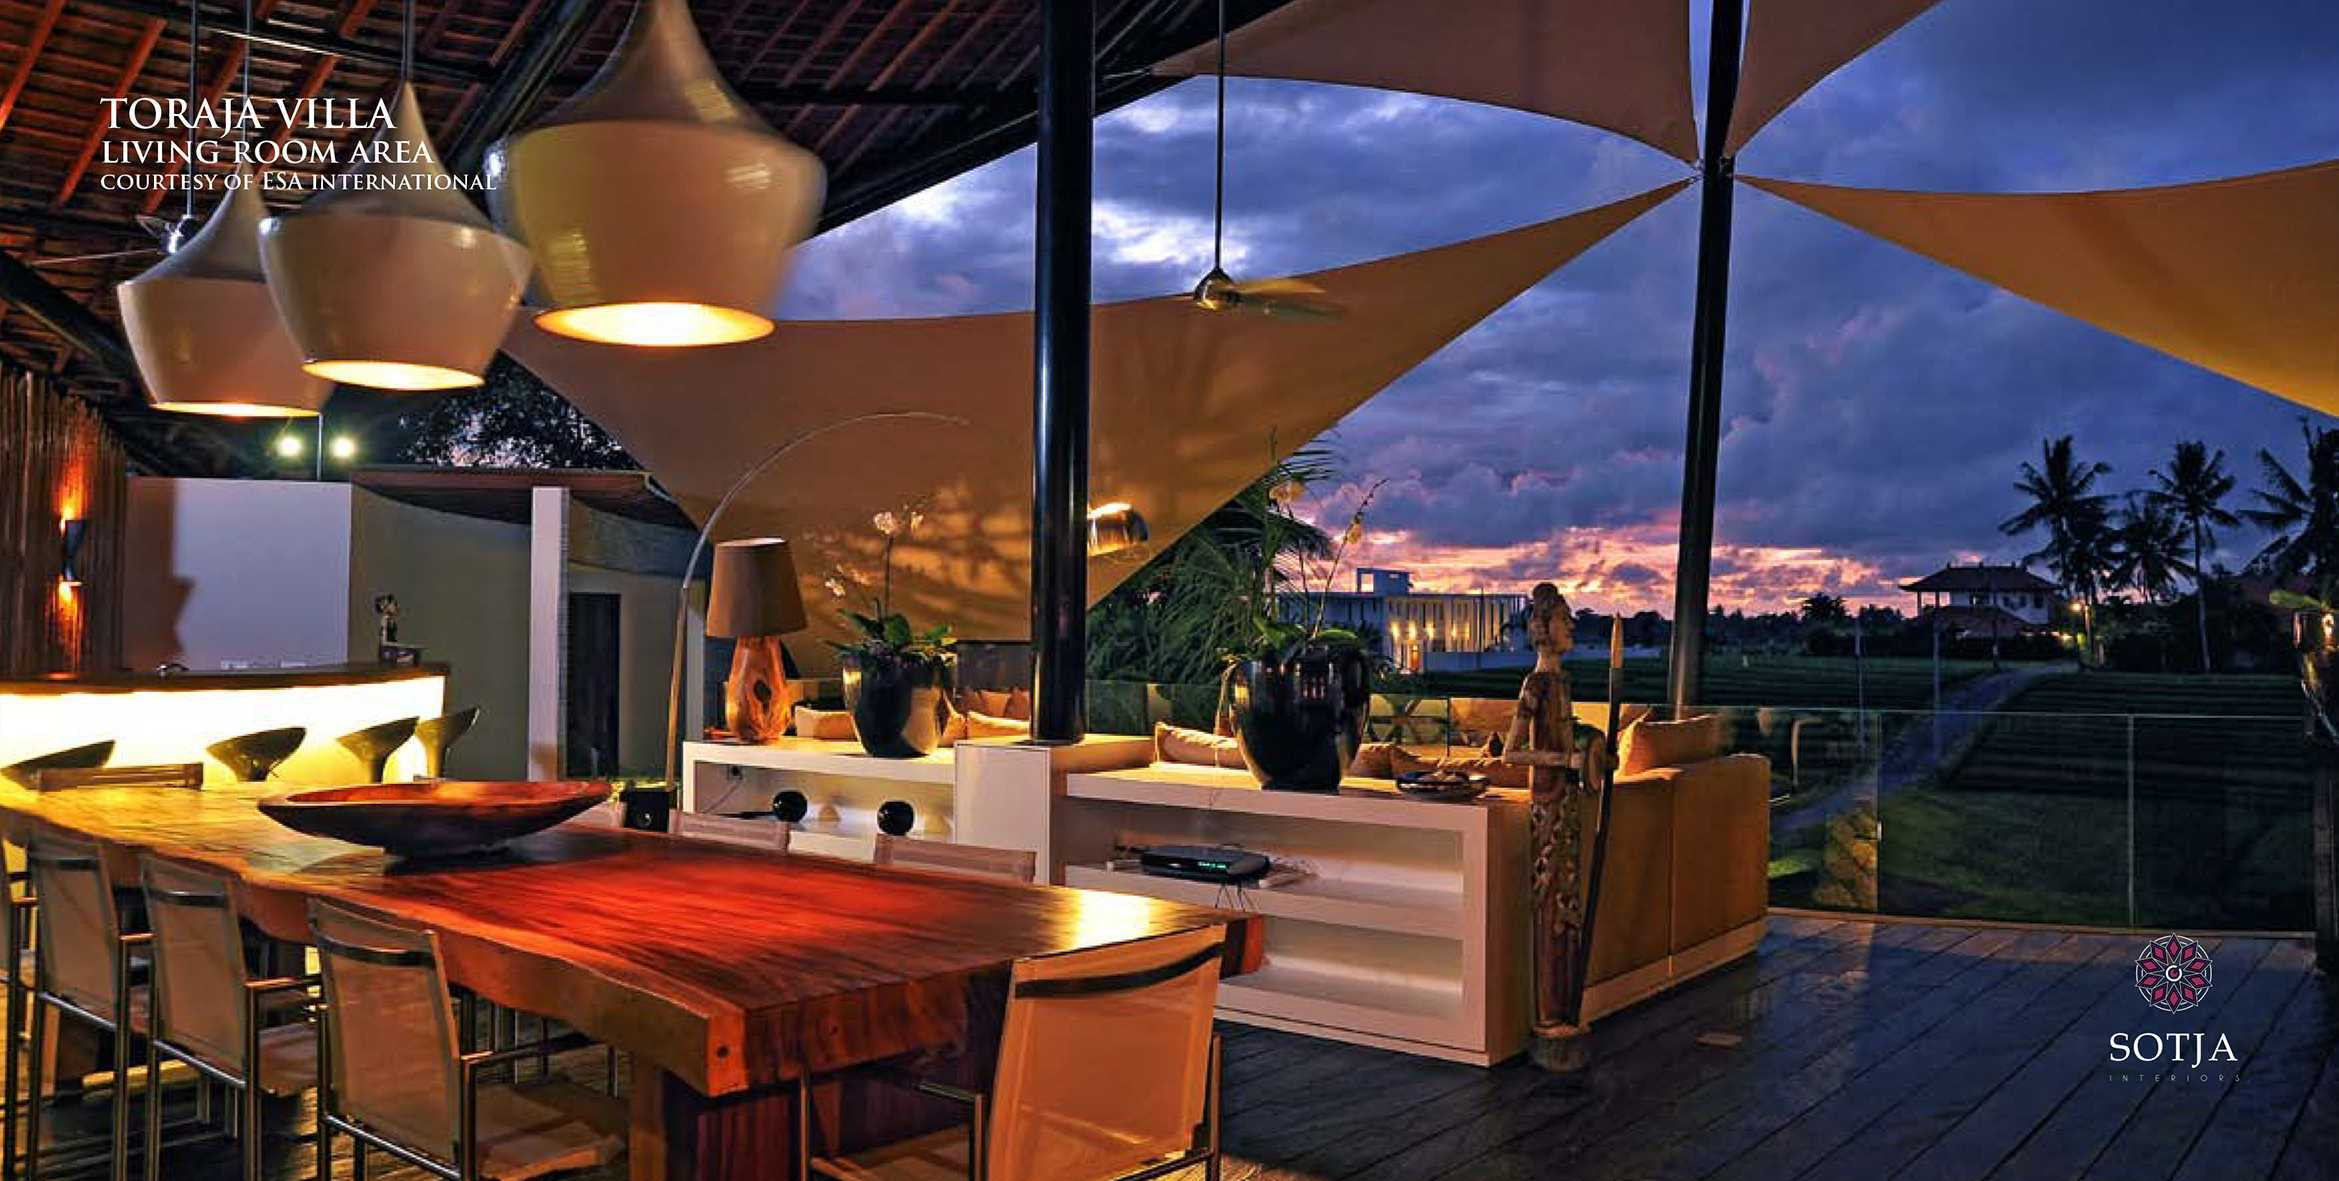 Sotja Interiors Toraja Villa At Canggu Bali, Indonesia Bali, Indonesia Living-Room-Area Tradisional  9971